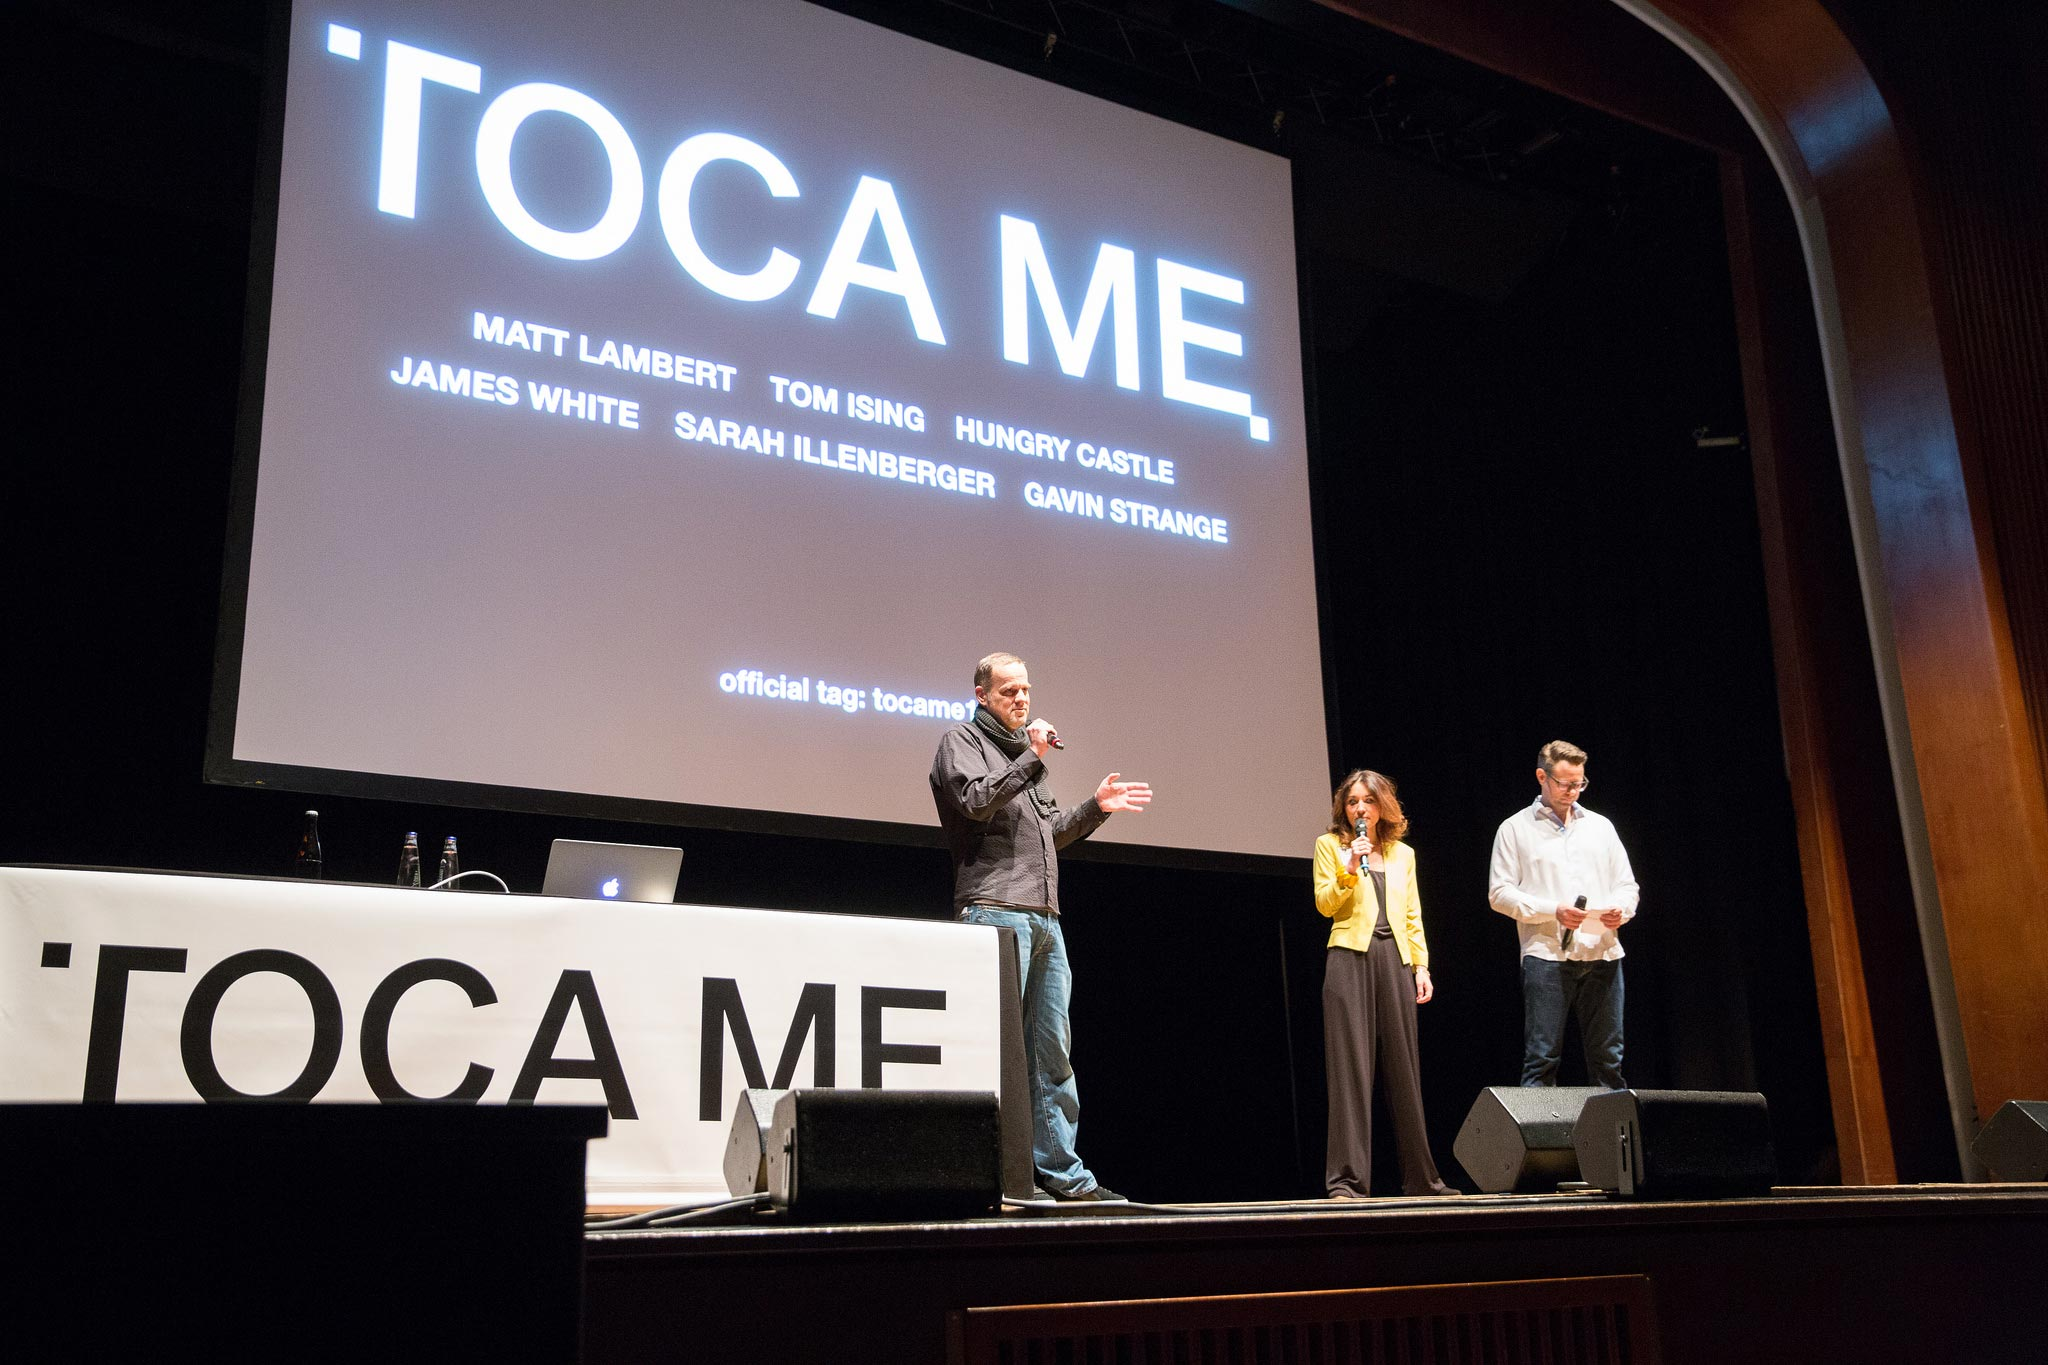 TOCA ME design conference 2016. Credits: https://flic.kr/s/aHskv4Gfrq